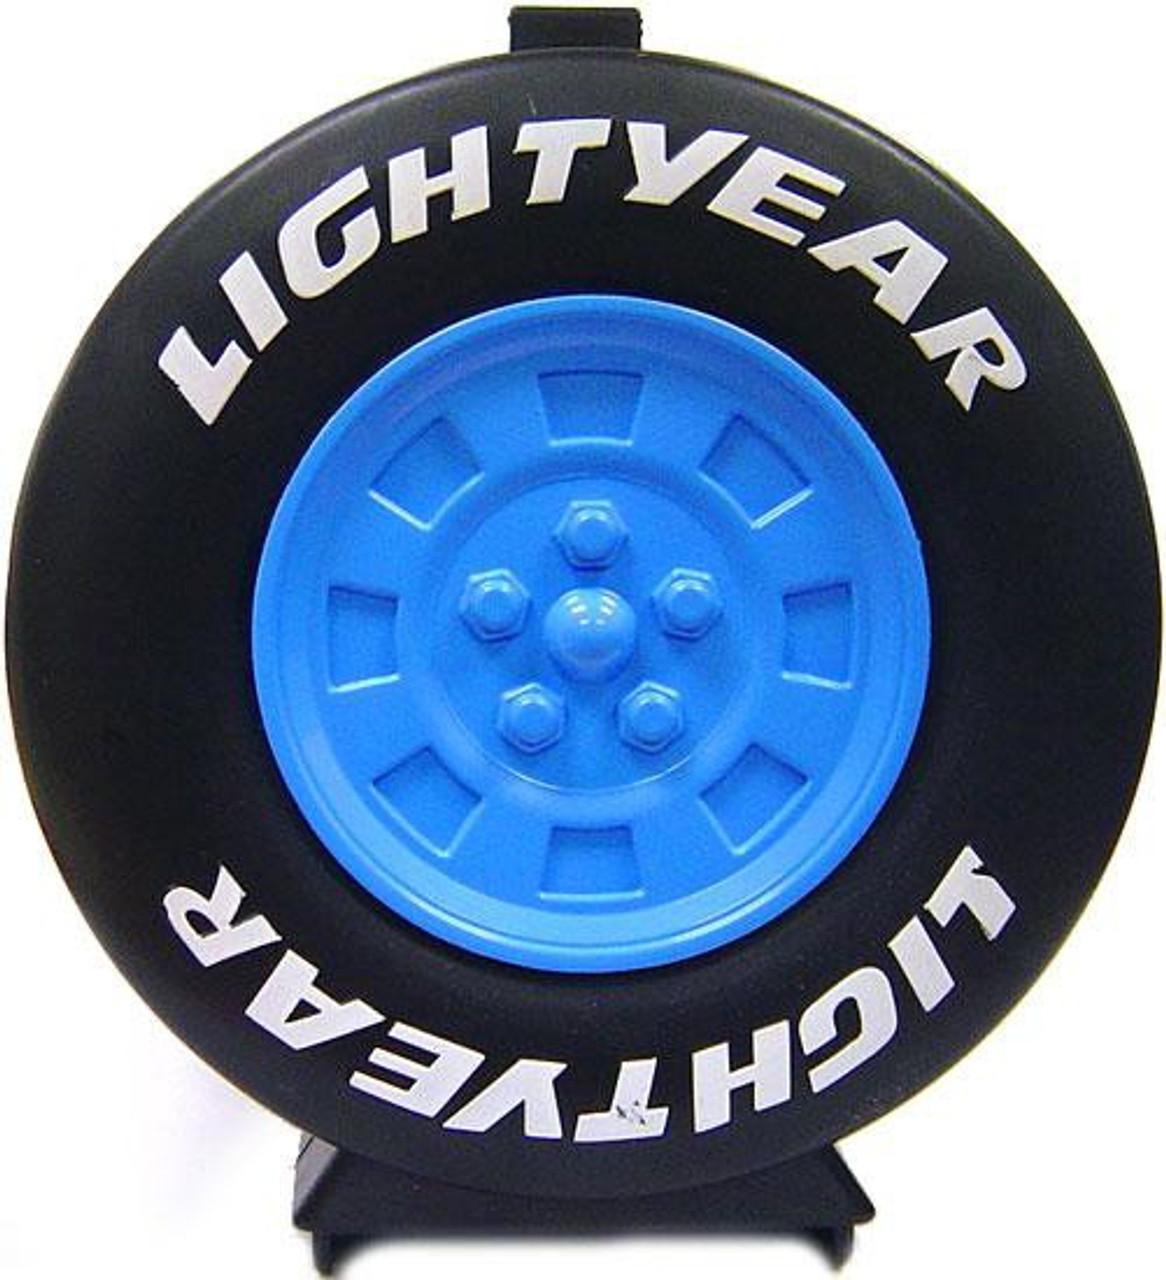 Disney Cars Loose Lightyear Tire Launcher [Loose]